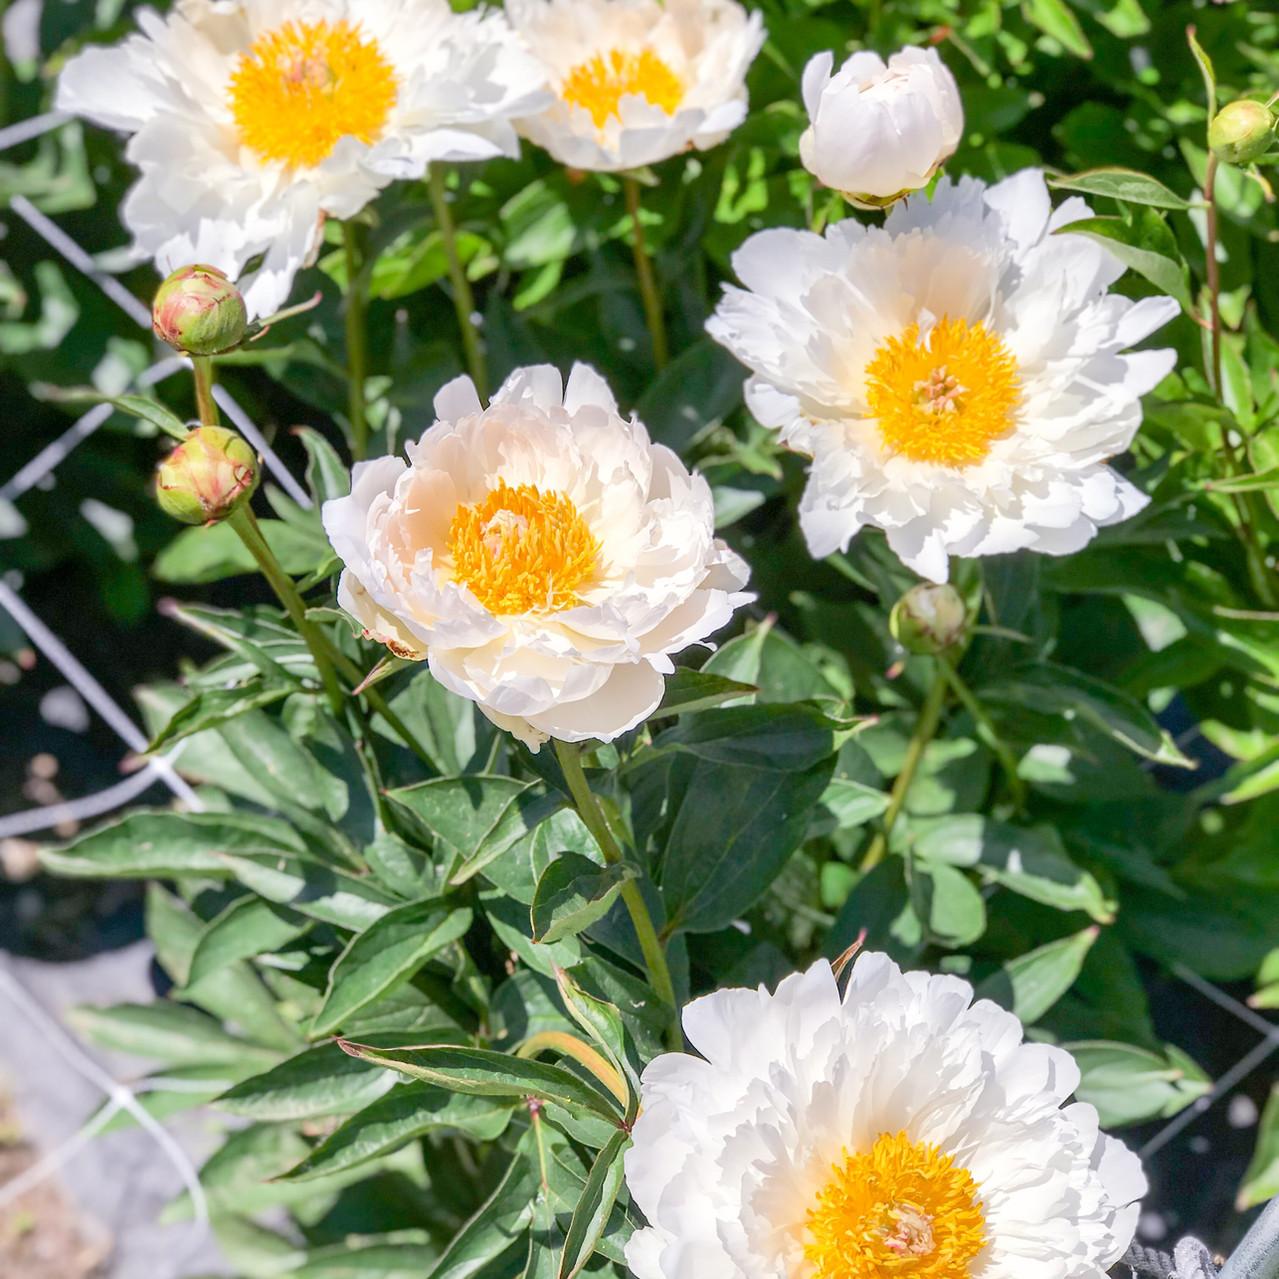 Scenic Place Peonies & Franzie's Flower Design